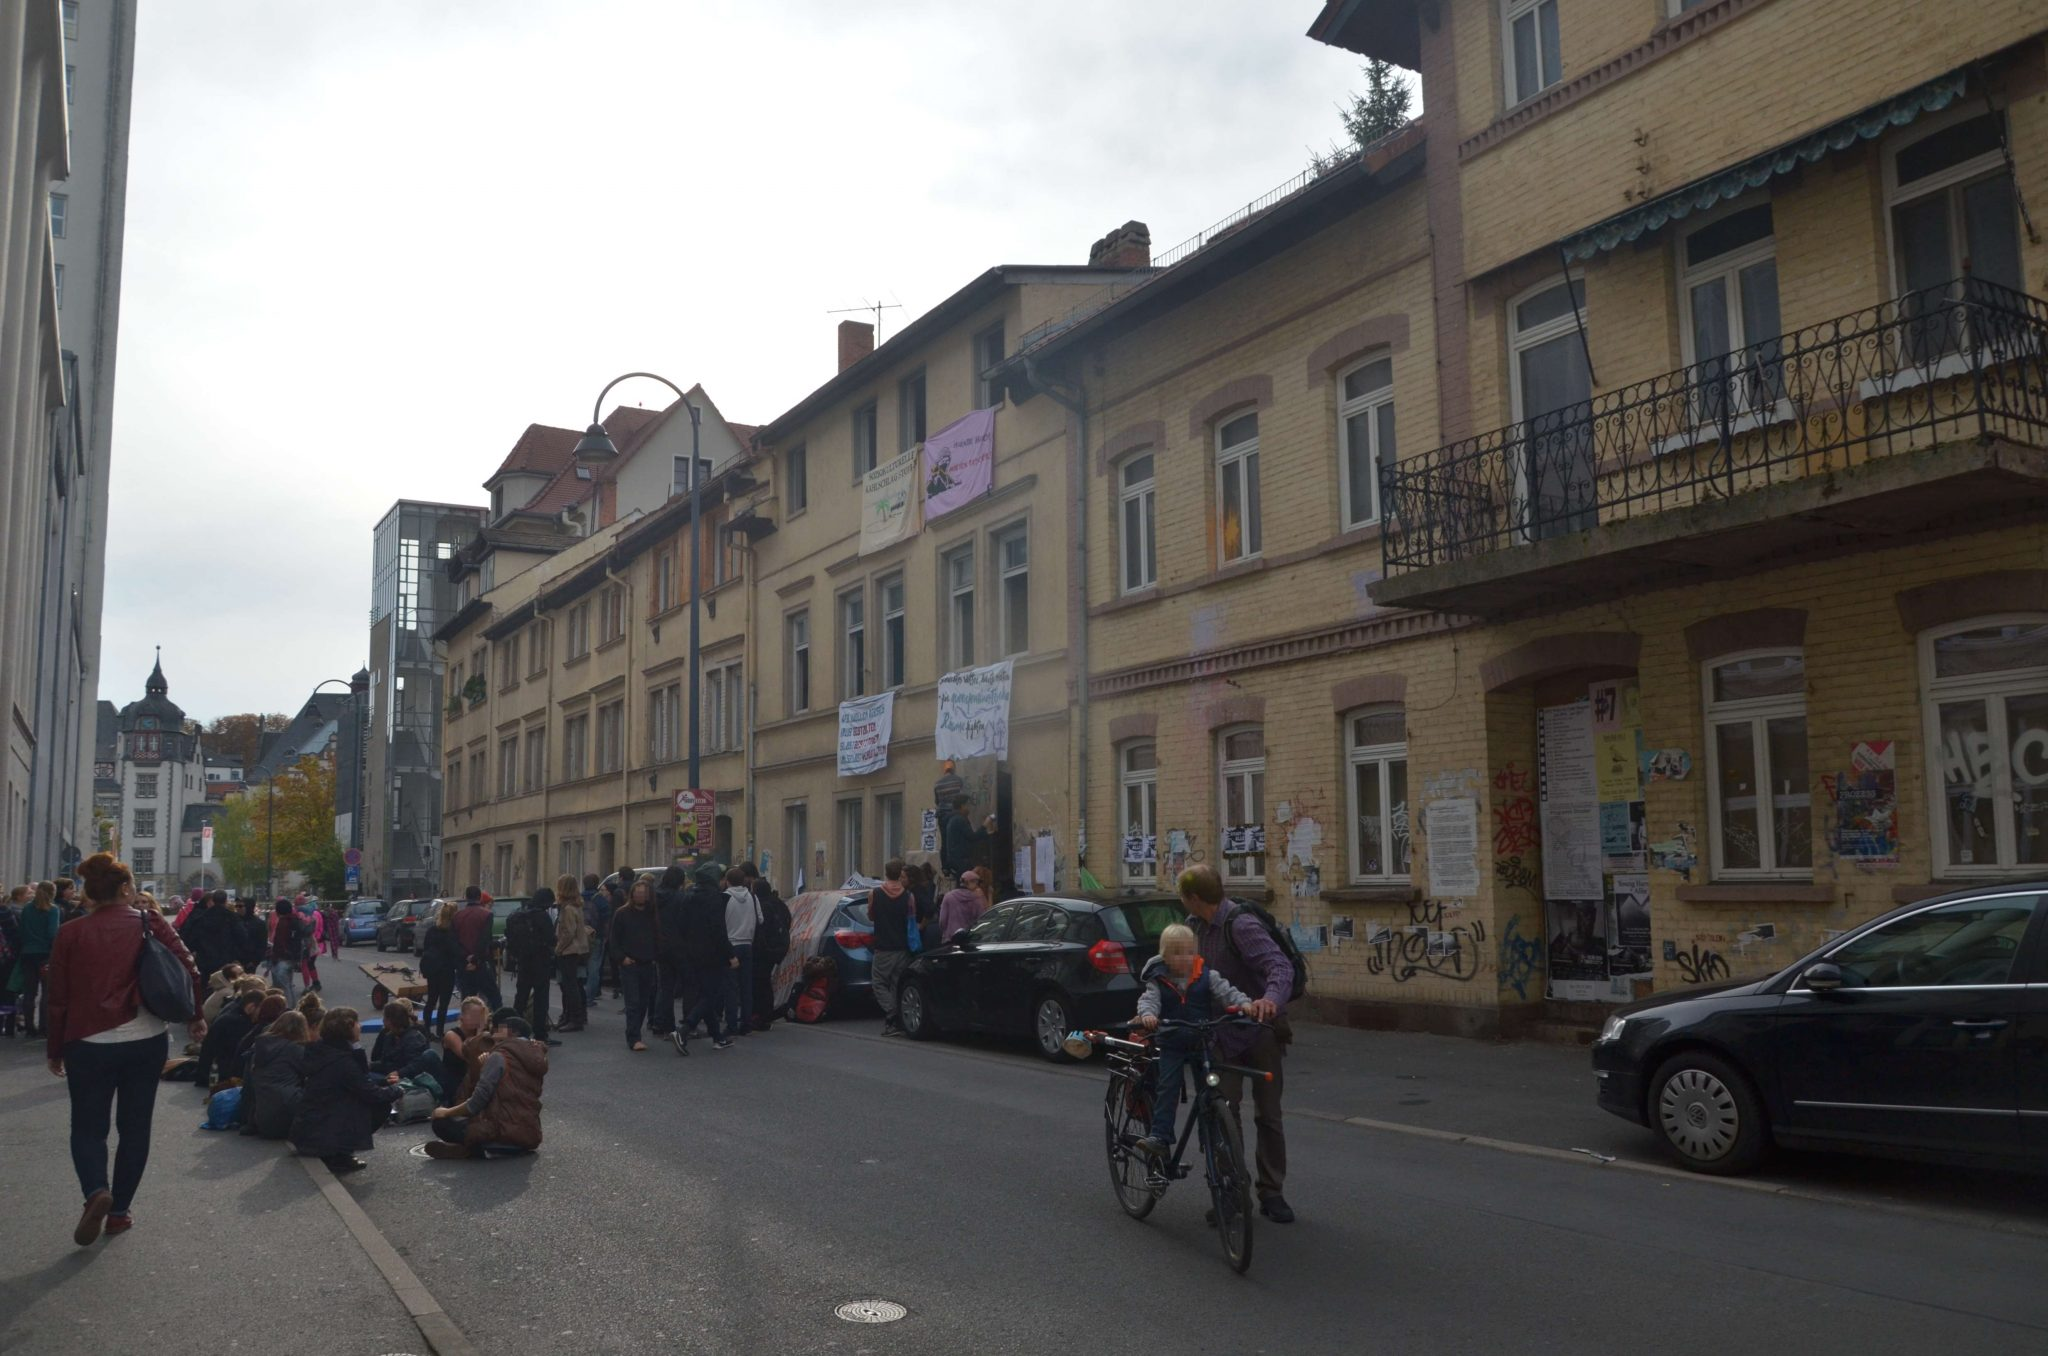 Prozess wegen Hausbesetzung: Stiftung lässt Häuser verfallen – Aktivist*innen sollen sich verantworten